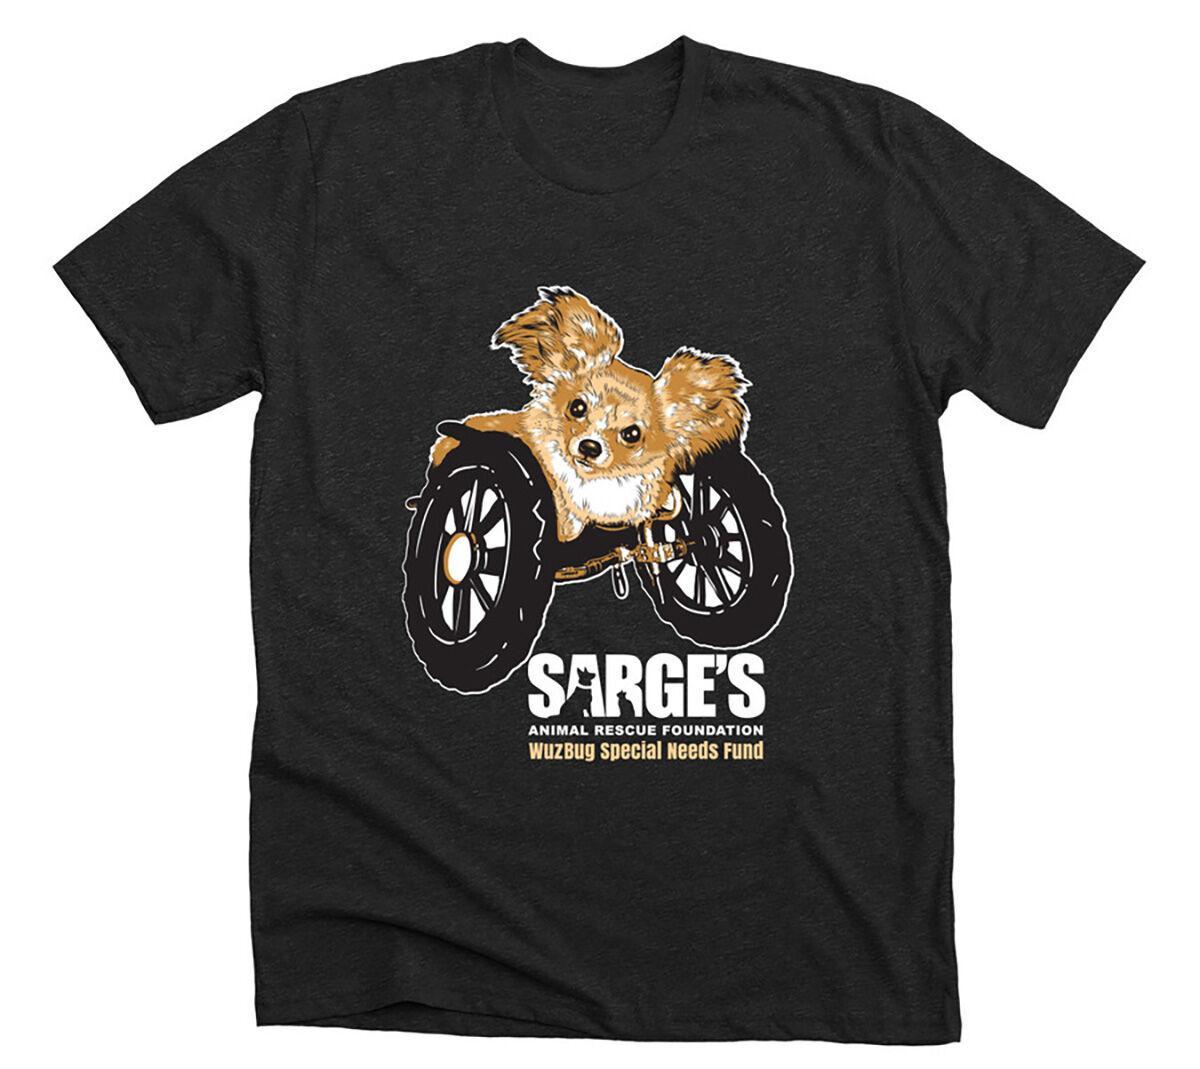 WuzBug Special Needs Fund shirt available on Bonfire